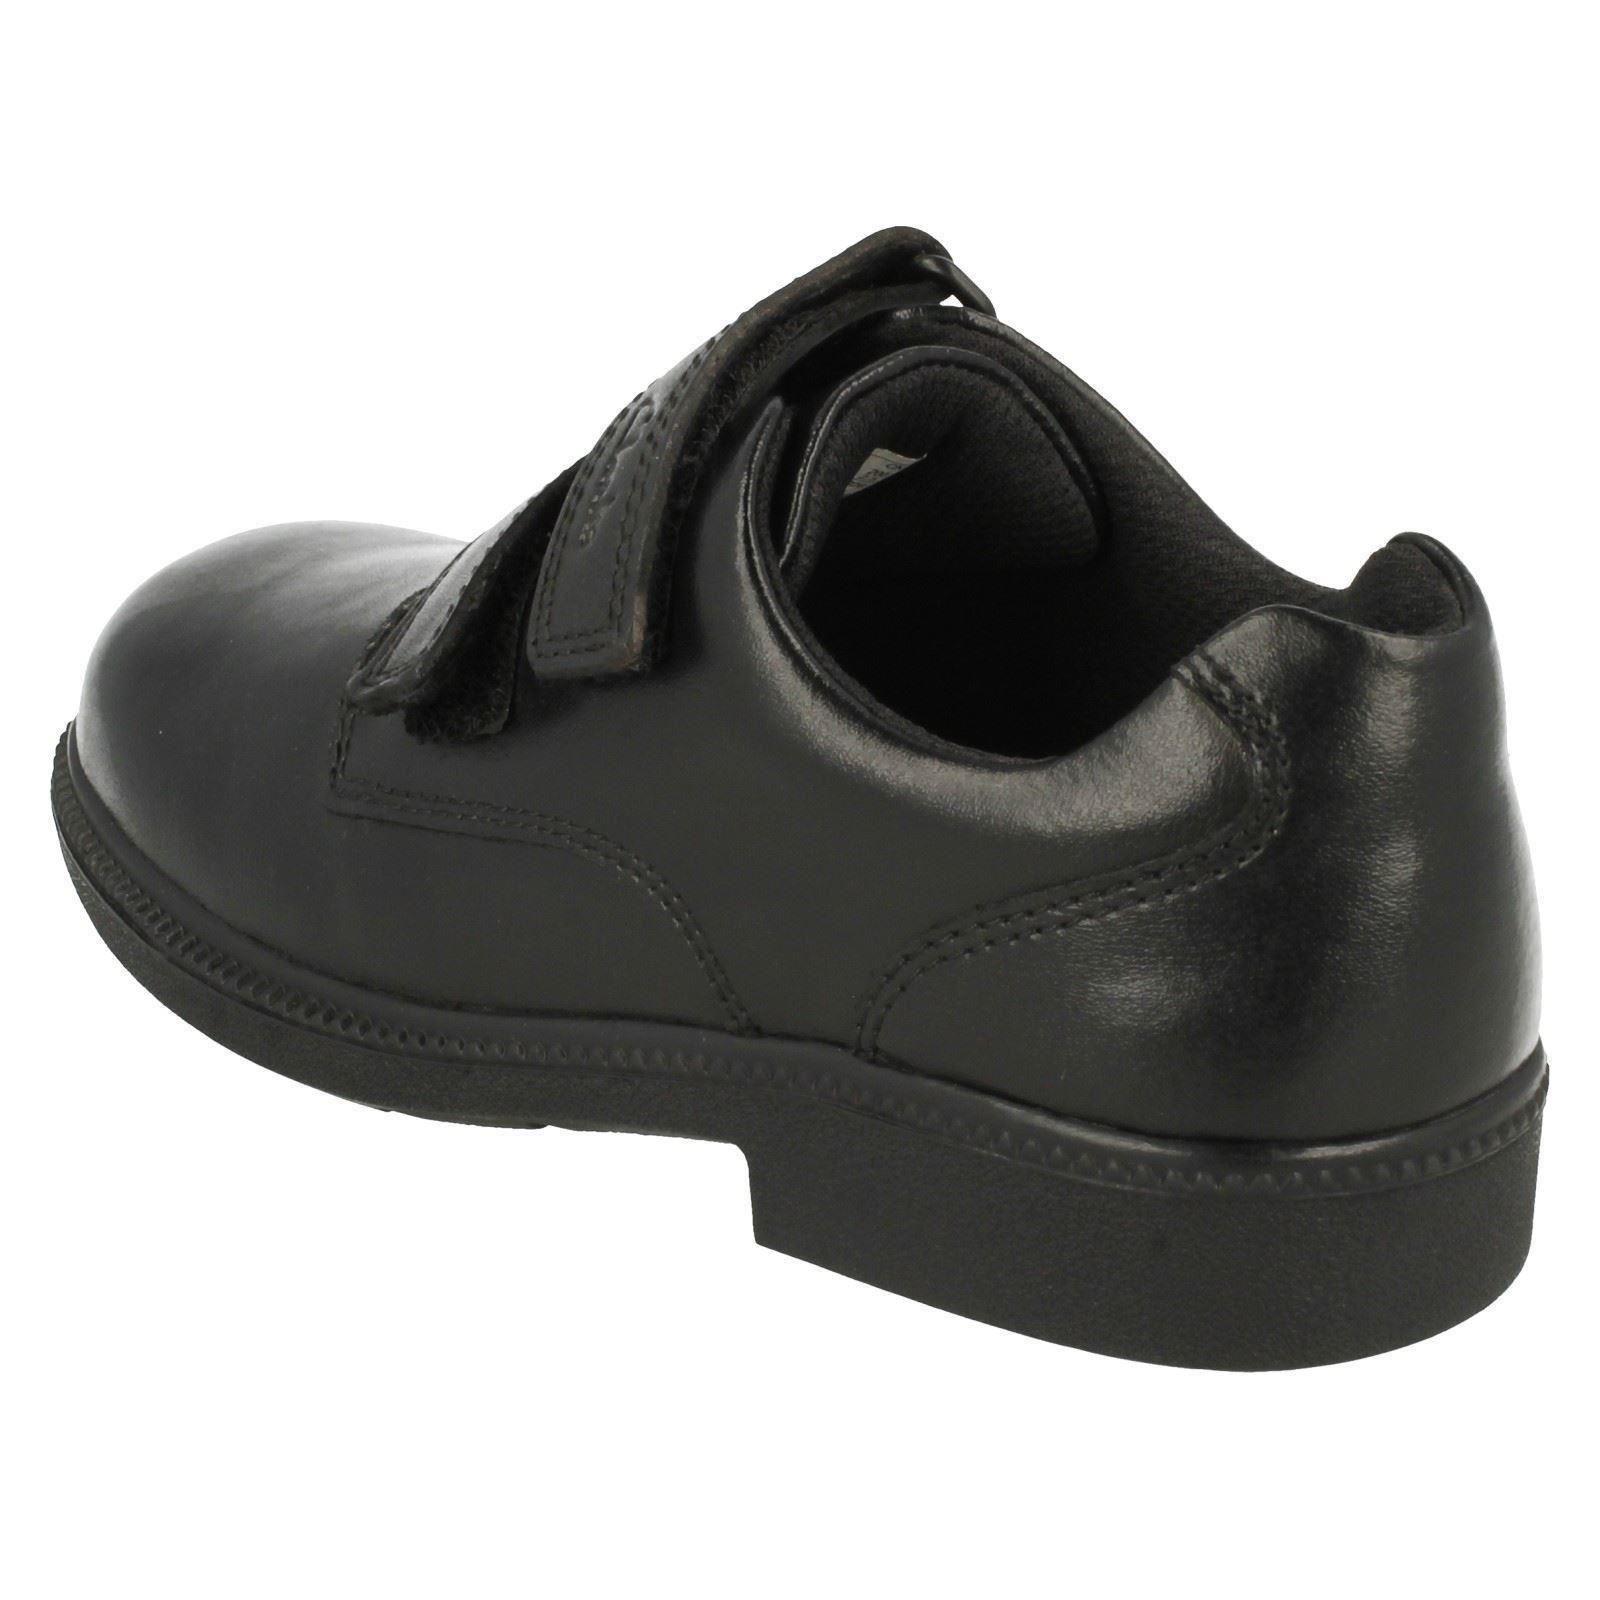 Boys Clarks Smart School Shoes /'Deaton Gate/'